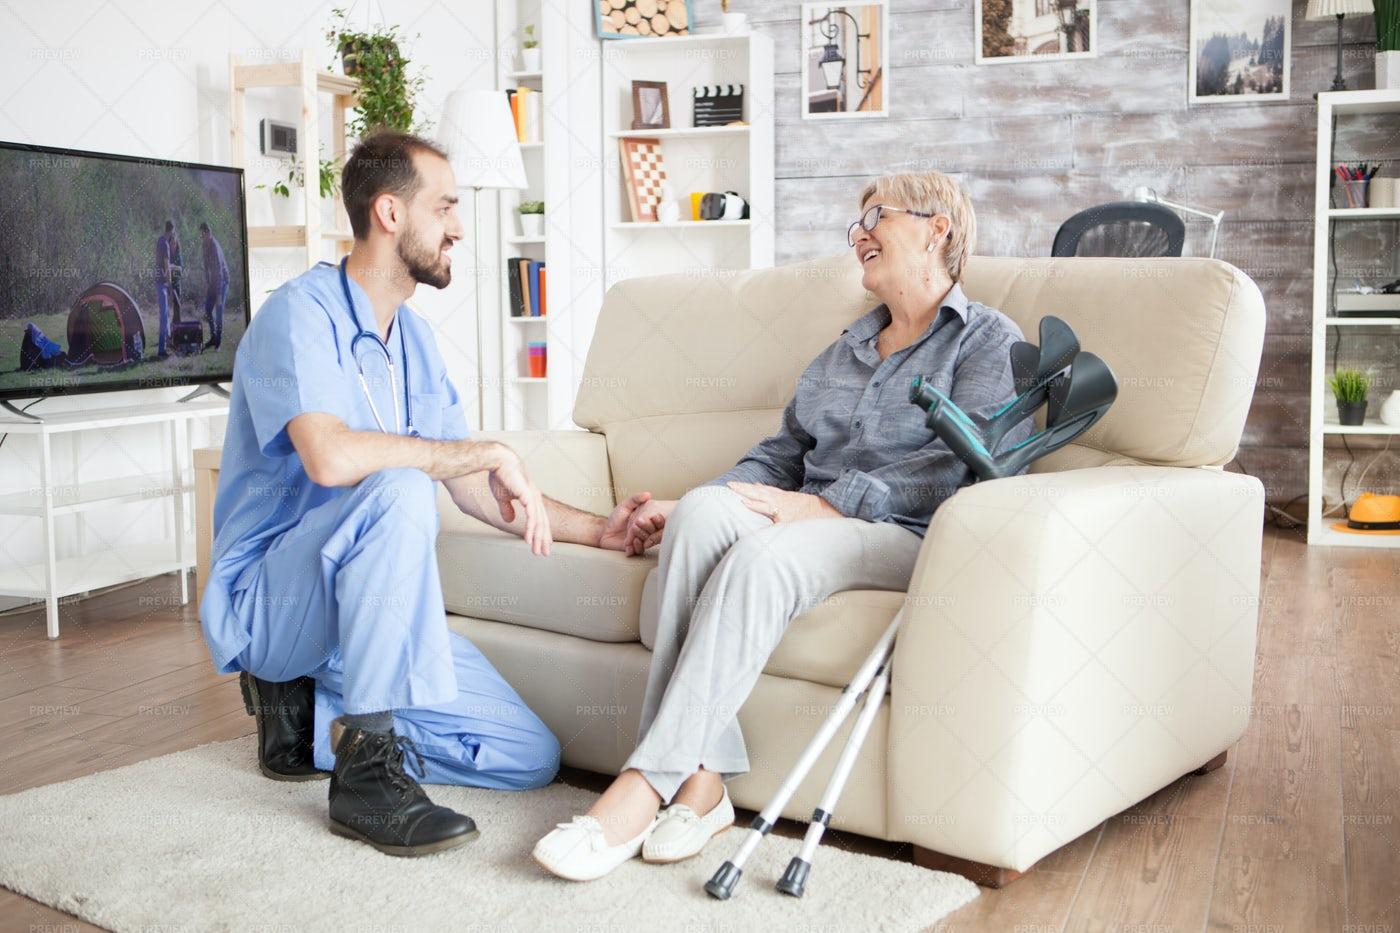 Joyful Old Woman In A Nursing Home: Stock Photos